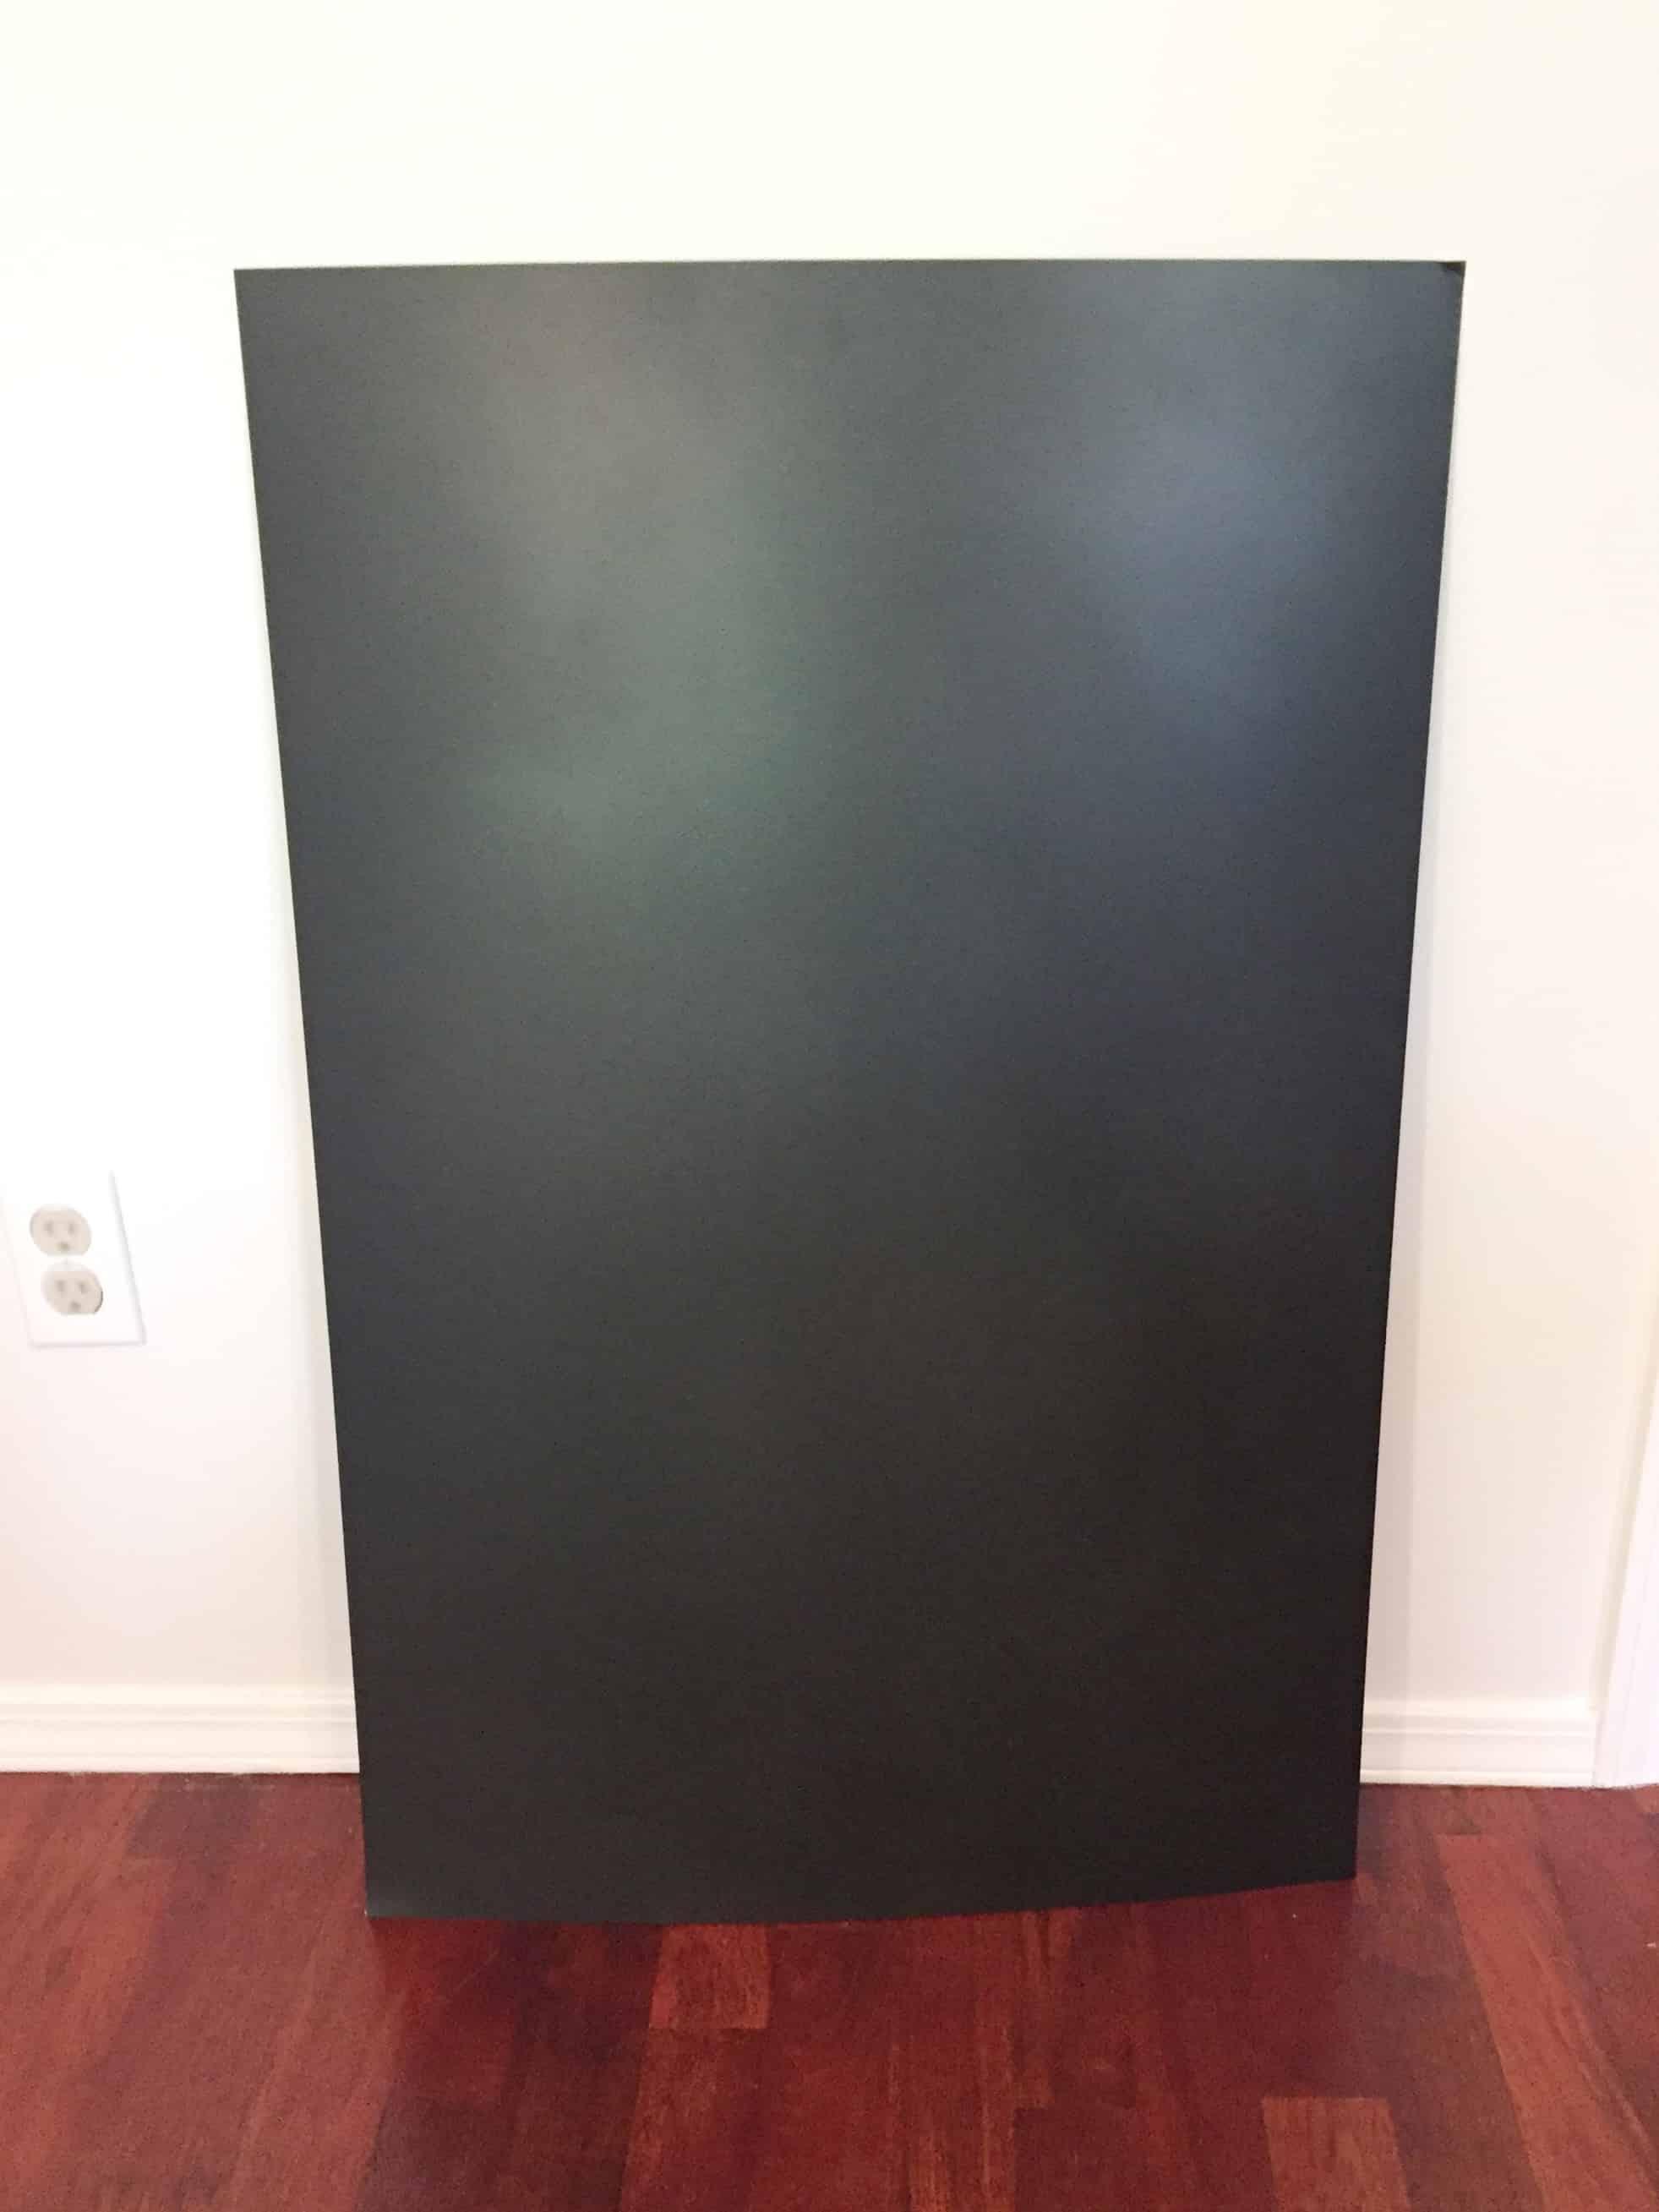 diy-Magnetic Chalkboard - www.arinsolangeathome.com